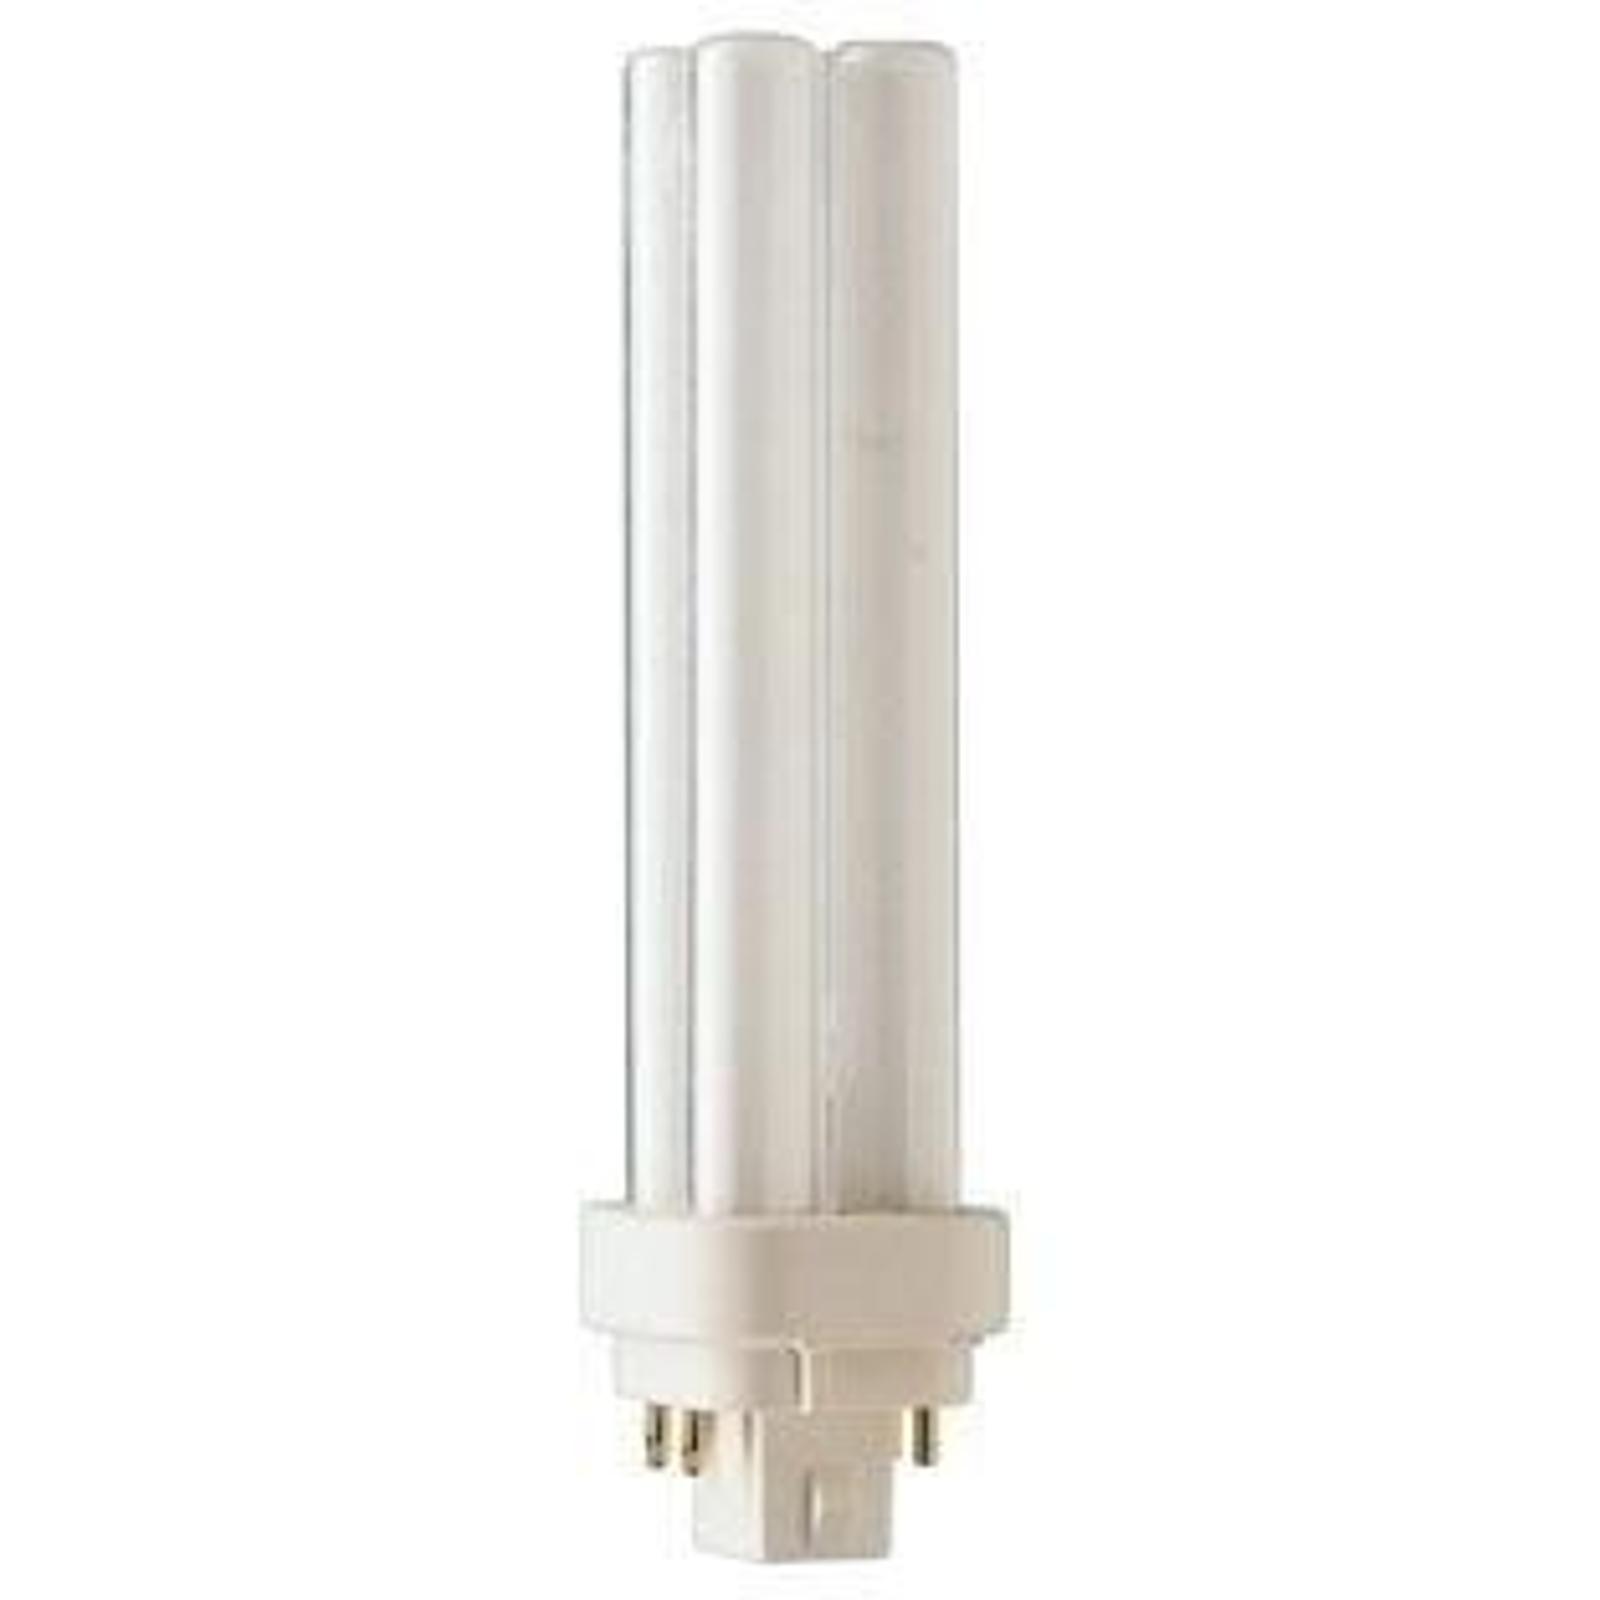 G24q 26W 840 Kompaktleuchtstofflampe DULUX D/E